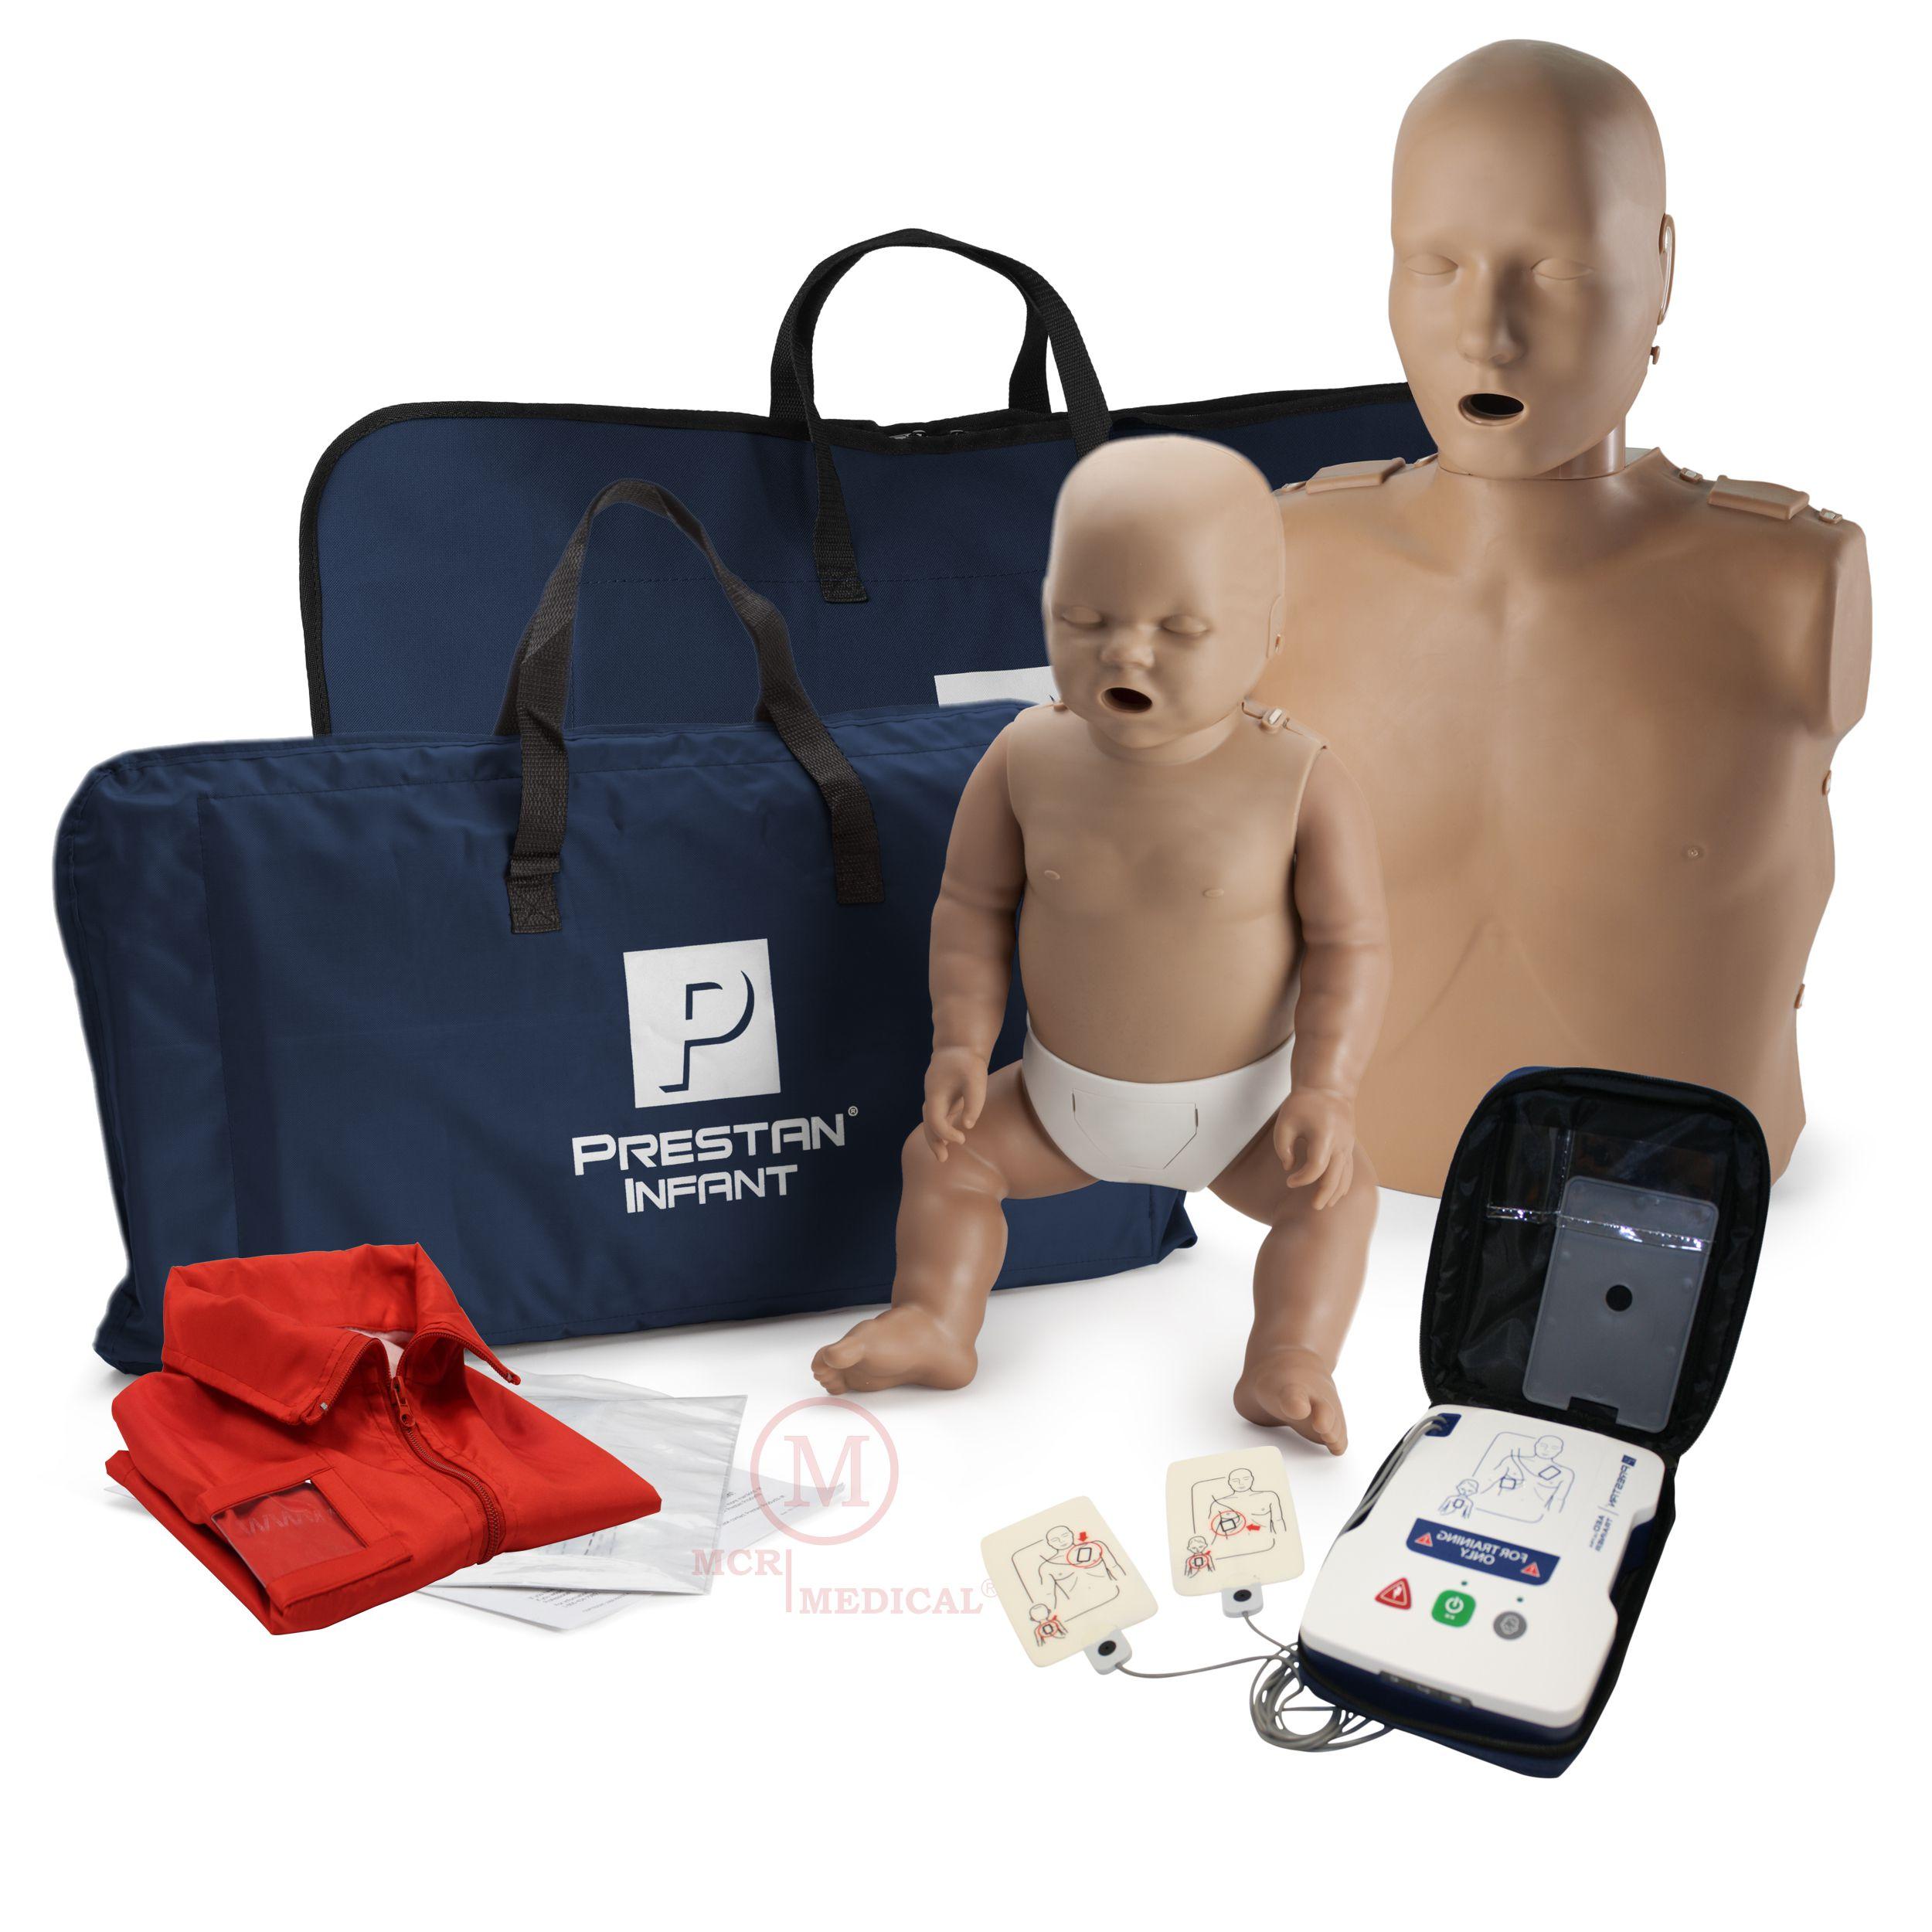 Medium Skin MCR Medical Prestan Infant CPR-AED Manikin with Rate Monitor